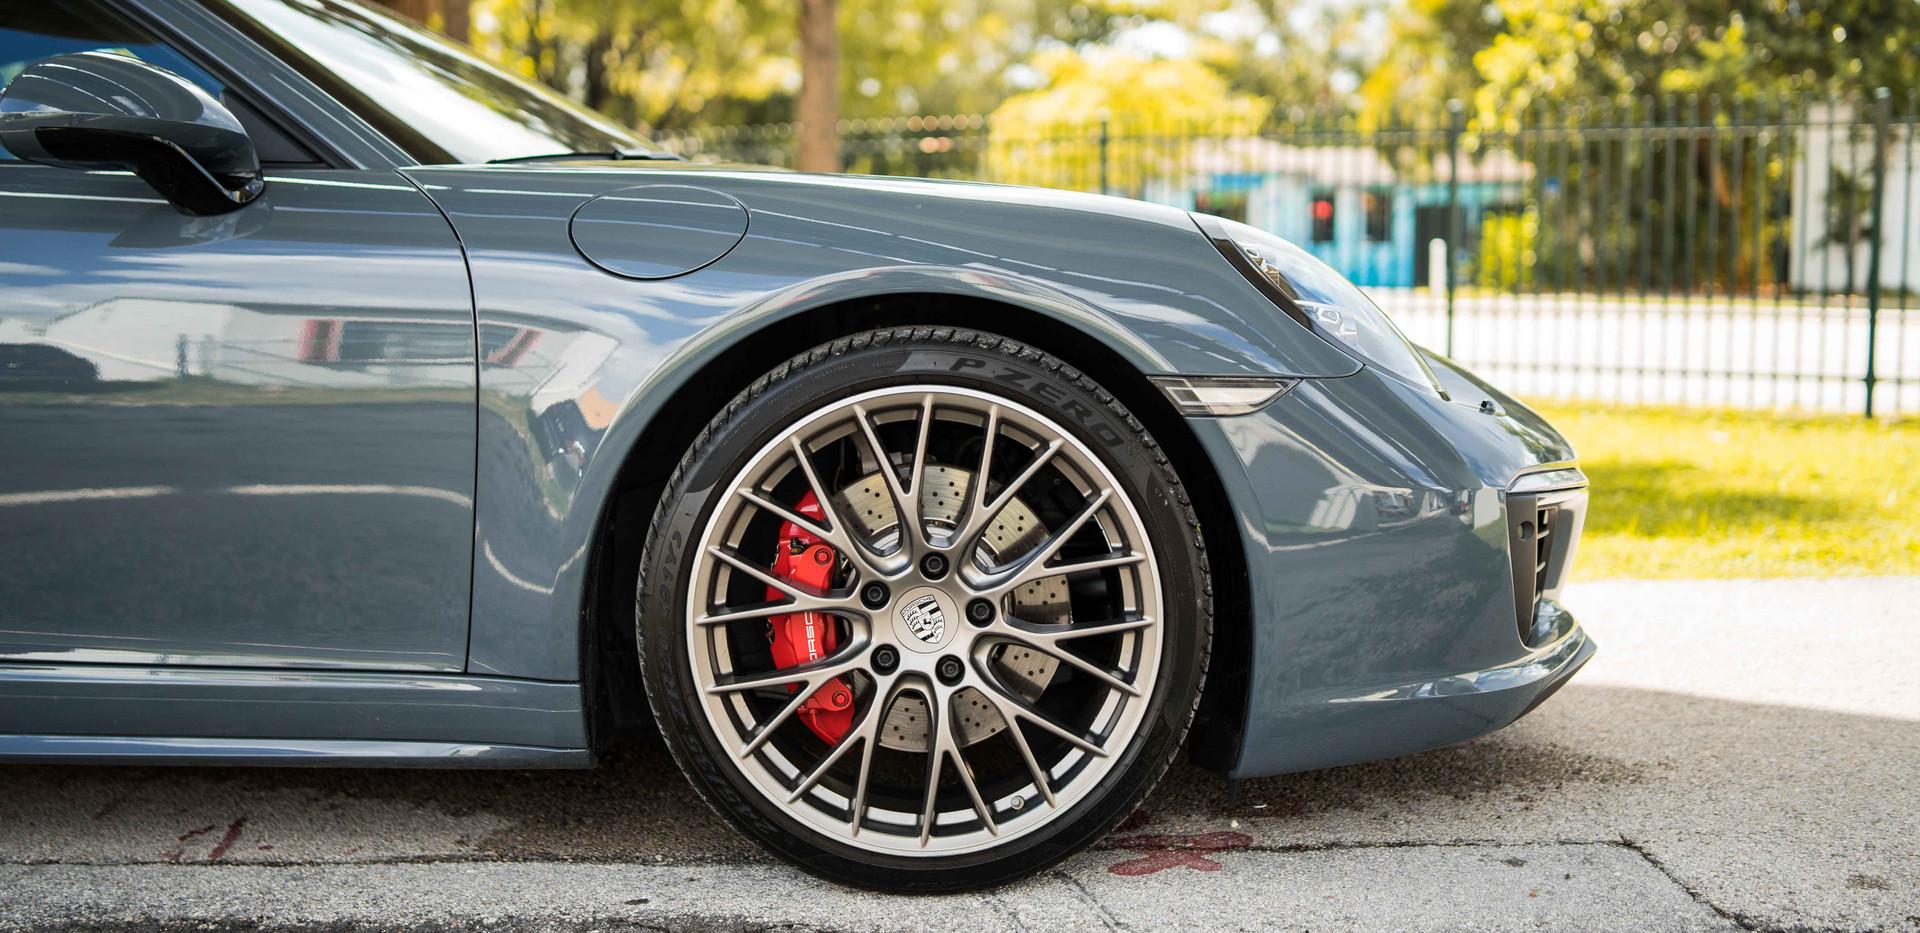 991.2 C4S Cabriolet